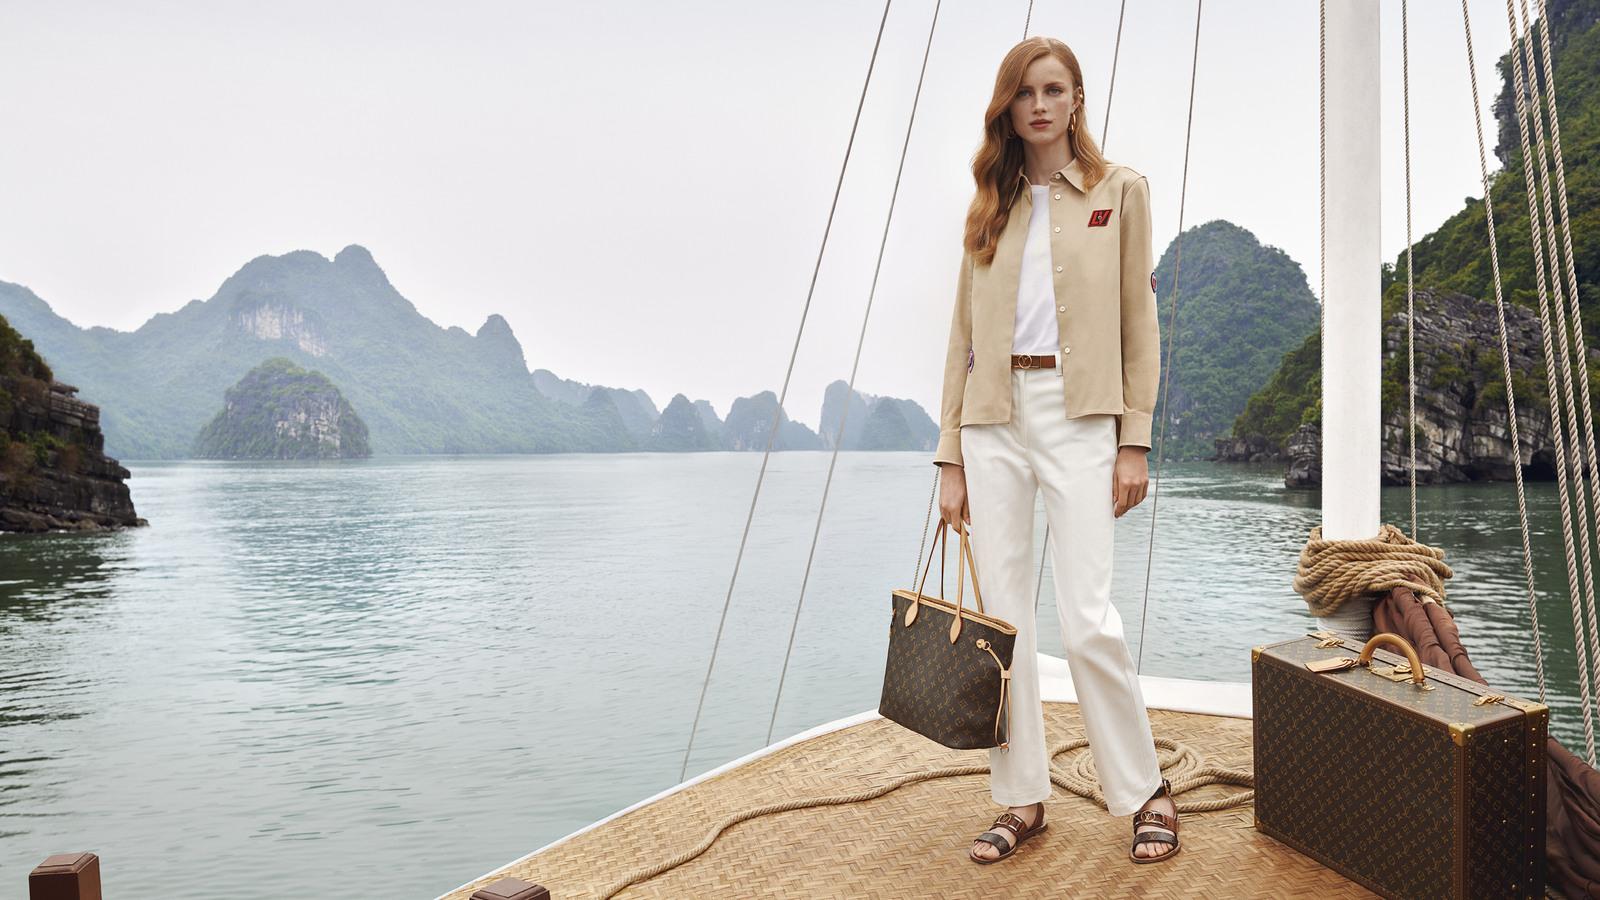 louis vuitton - 3 1568261402 - Việt Nam tuyệt đẹp trong quảng cáo mới của Louis Vuitton